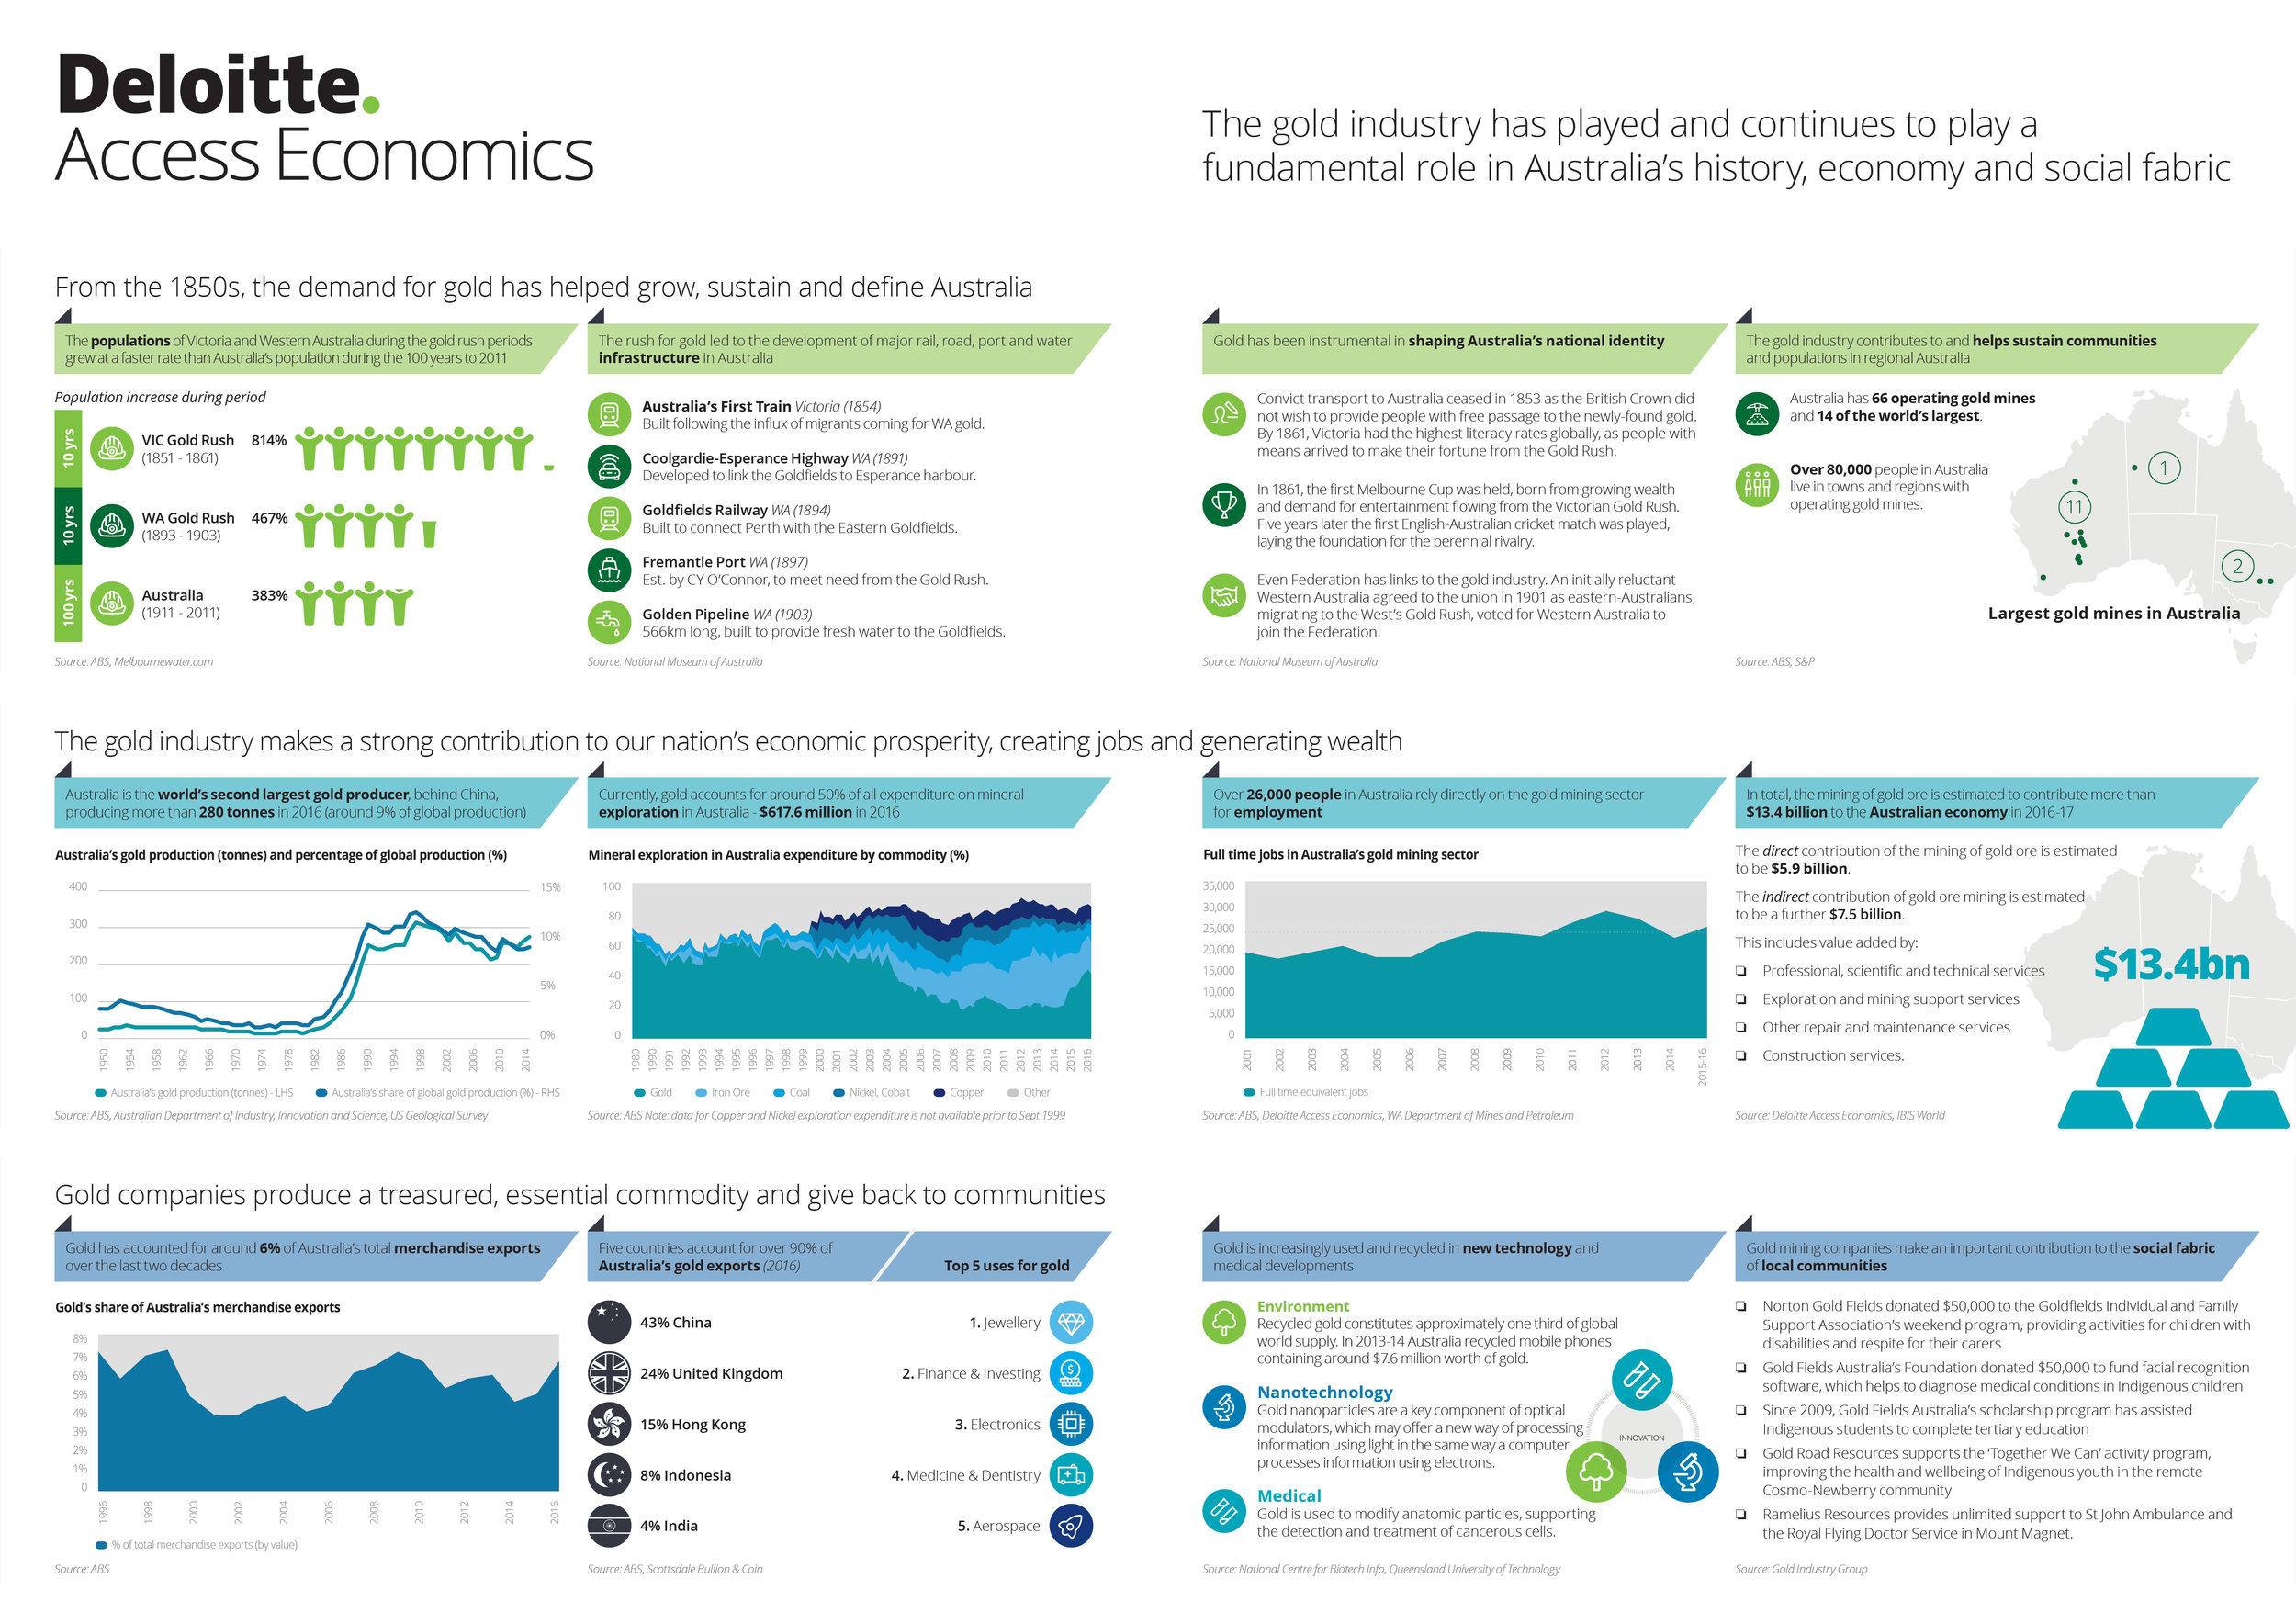 Deloitte Access Economics Research